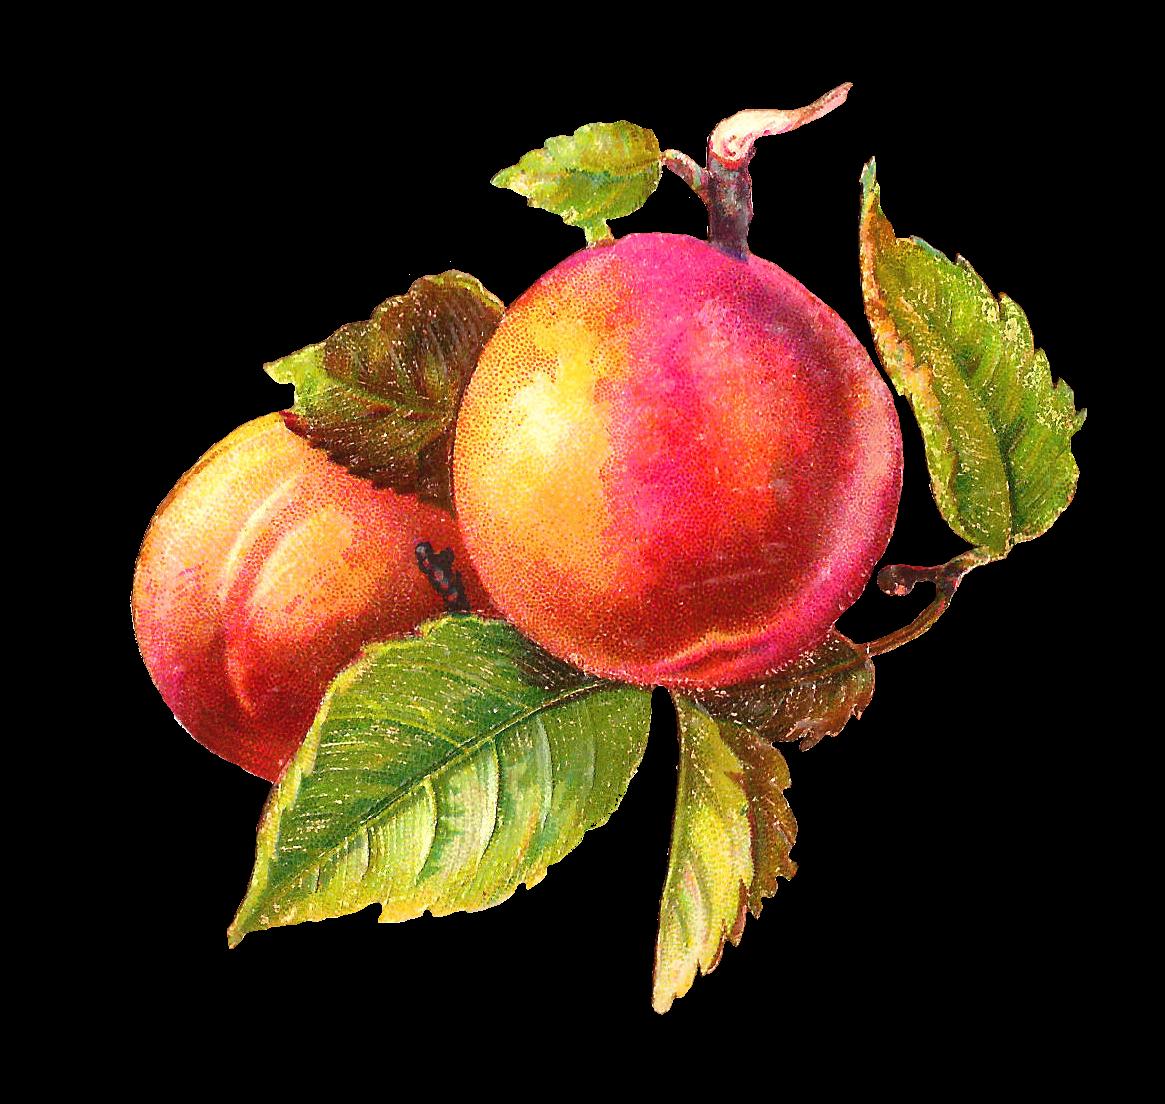 Antique images free fruit. Fruits clipart victorian